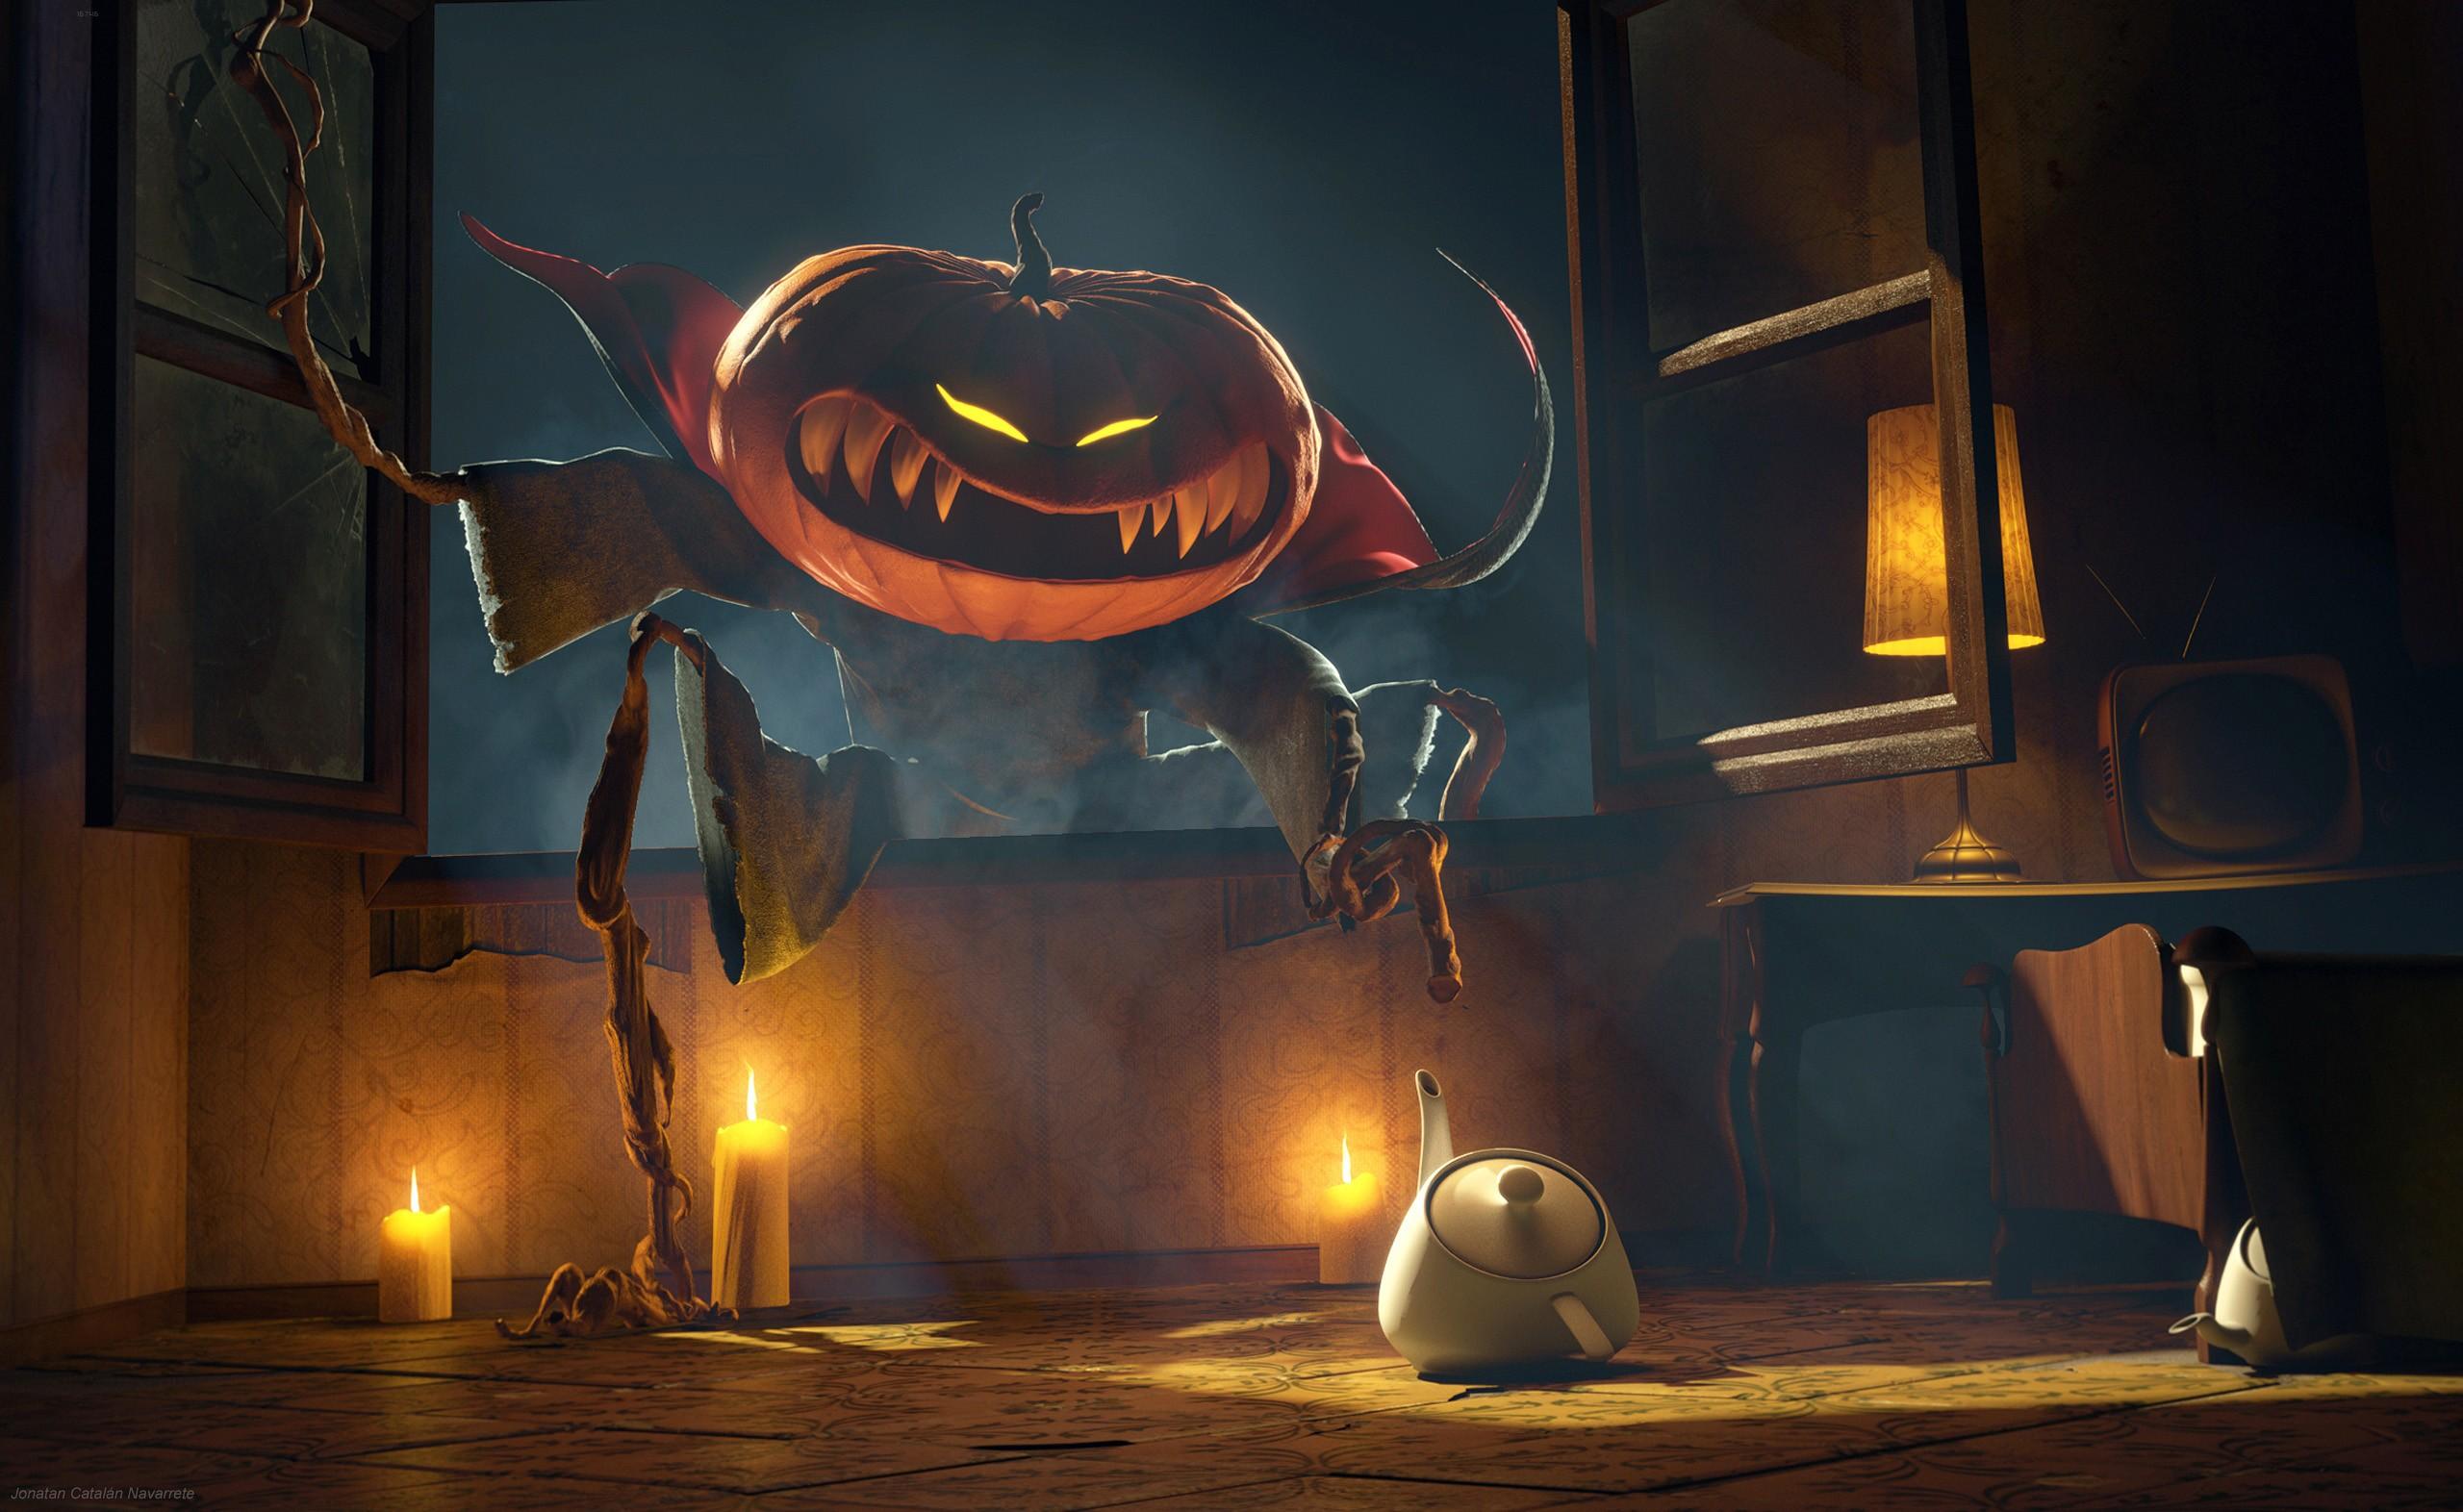 General 2560x1572 Halloween spooky pumpkin artwork glowing eyes